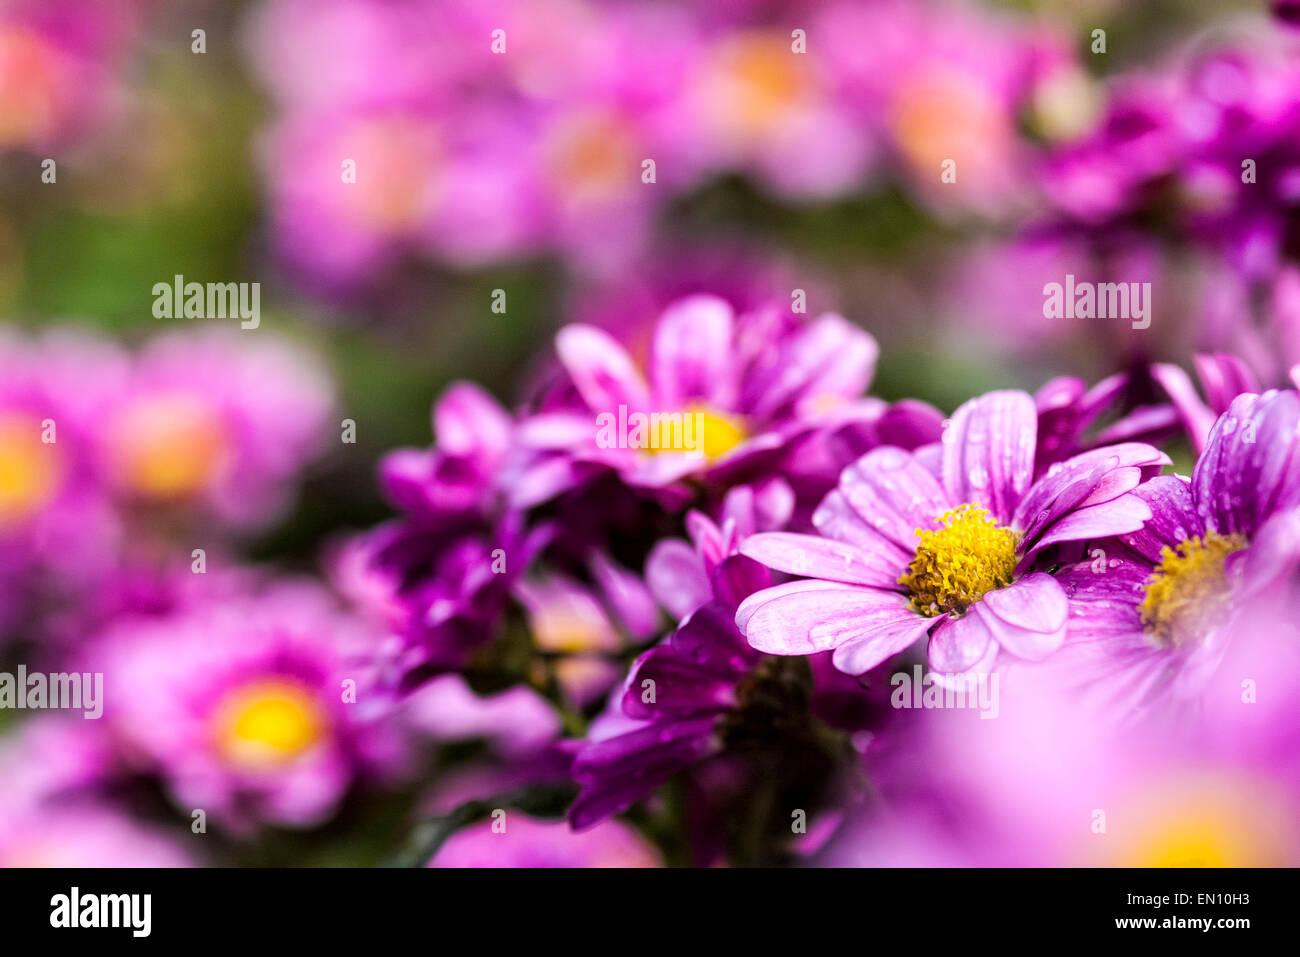 Field daisy flowers adv others stock photos field daisy flowers field of daisy flowers for adv or others purpose use stock image izmirmasajfo